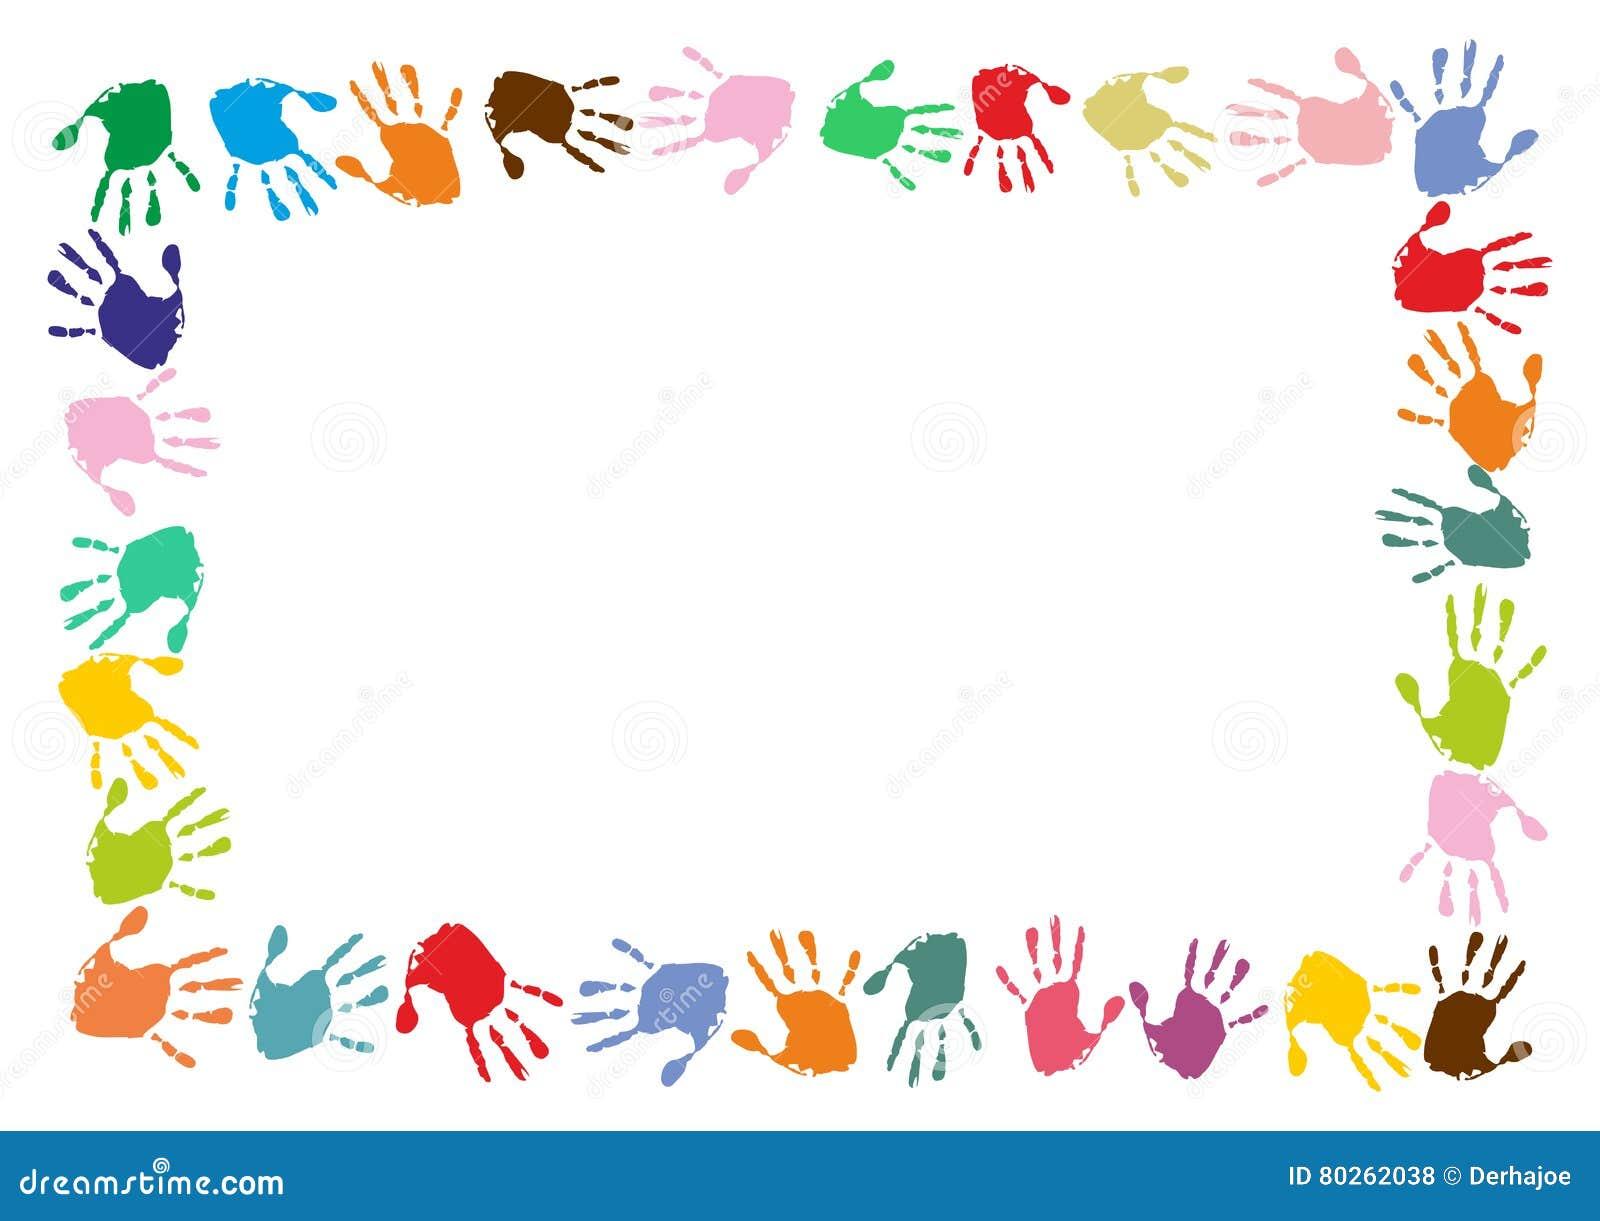 hand print boarder stock illustration illustration of print 80262038